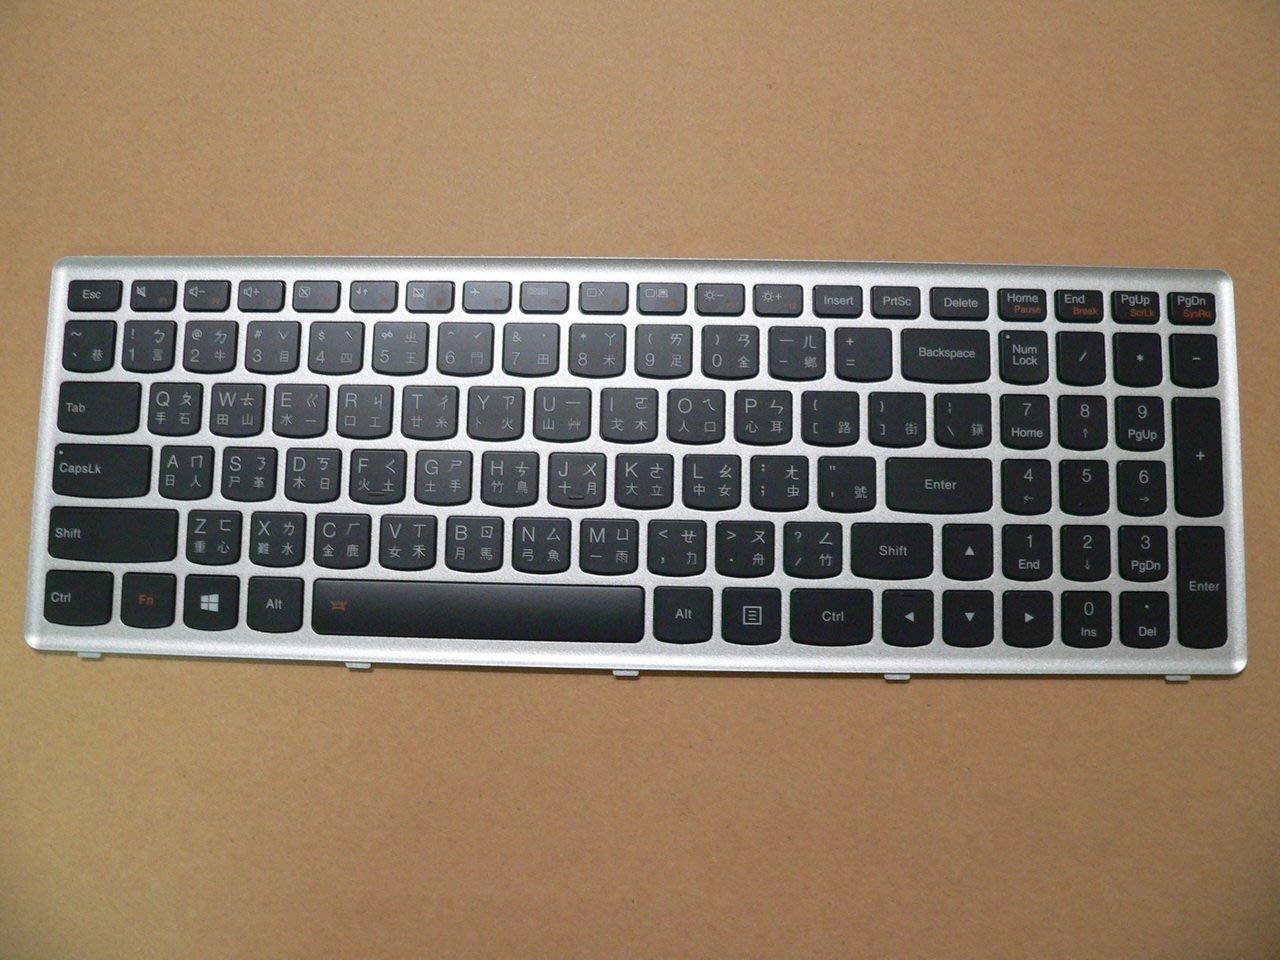 聯想 Lenovo 中文鍵盤  U510 Keyboard  帶背光